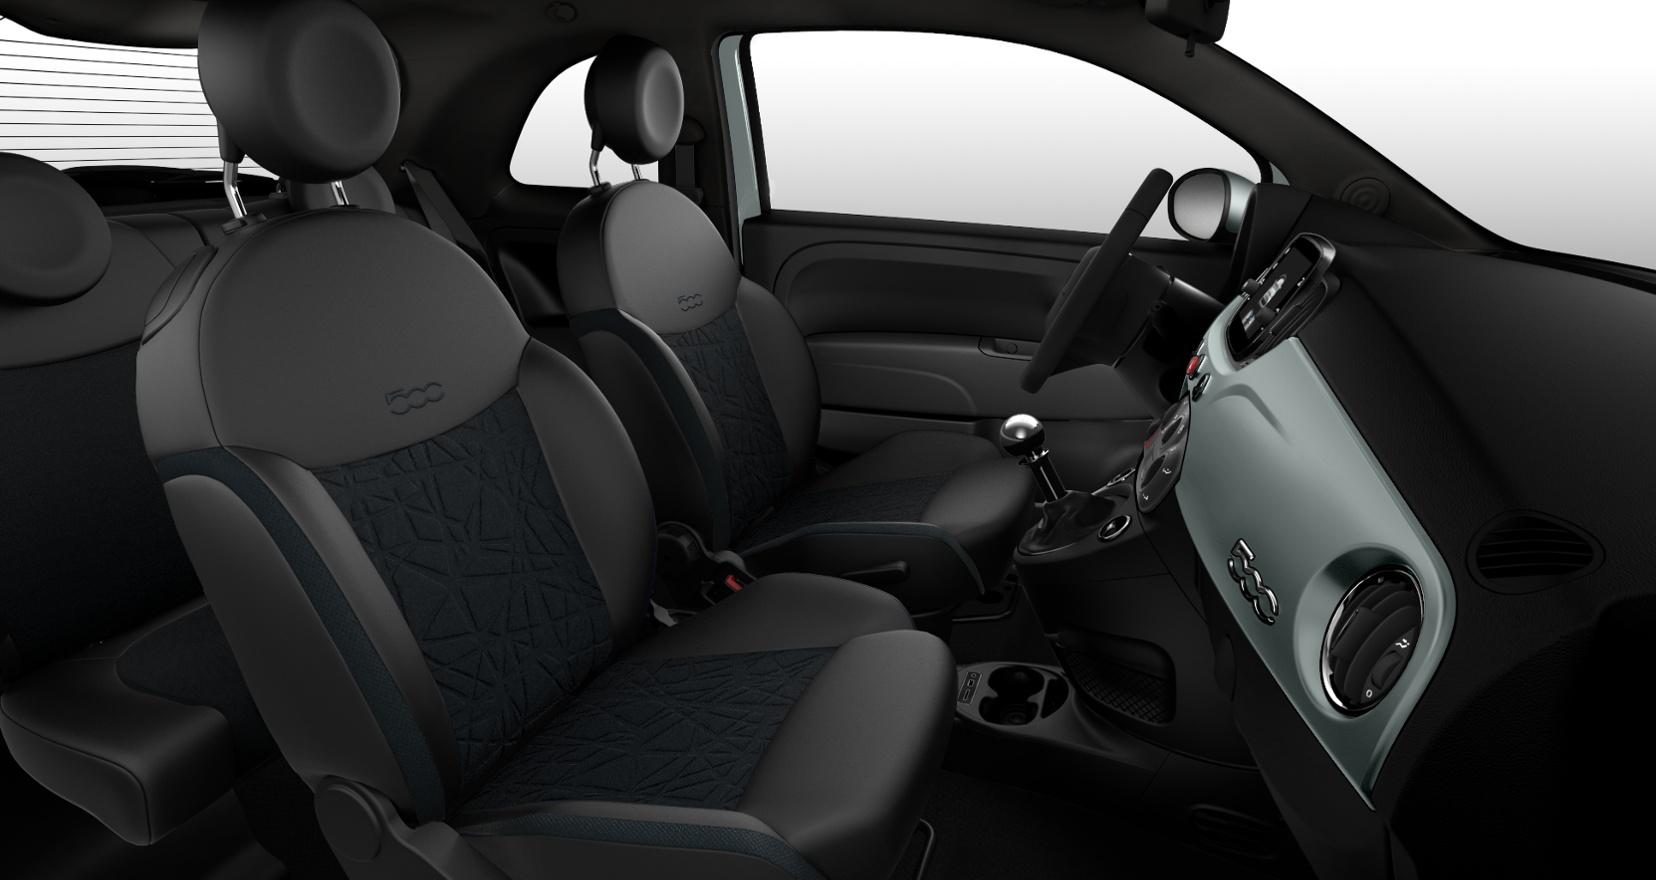 Fiat 500 hybrid launch edition - interieur